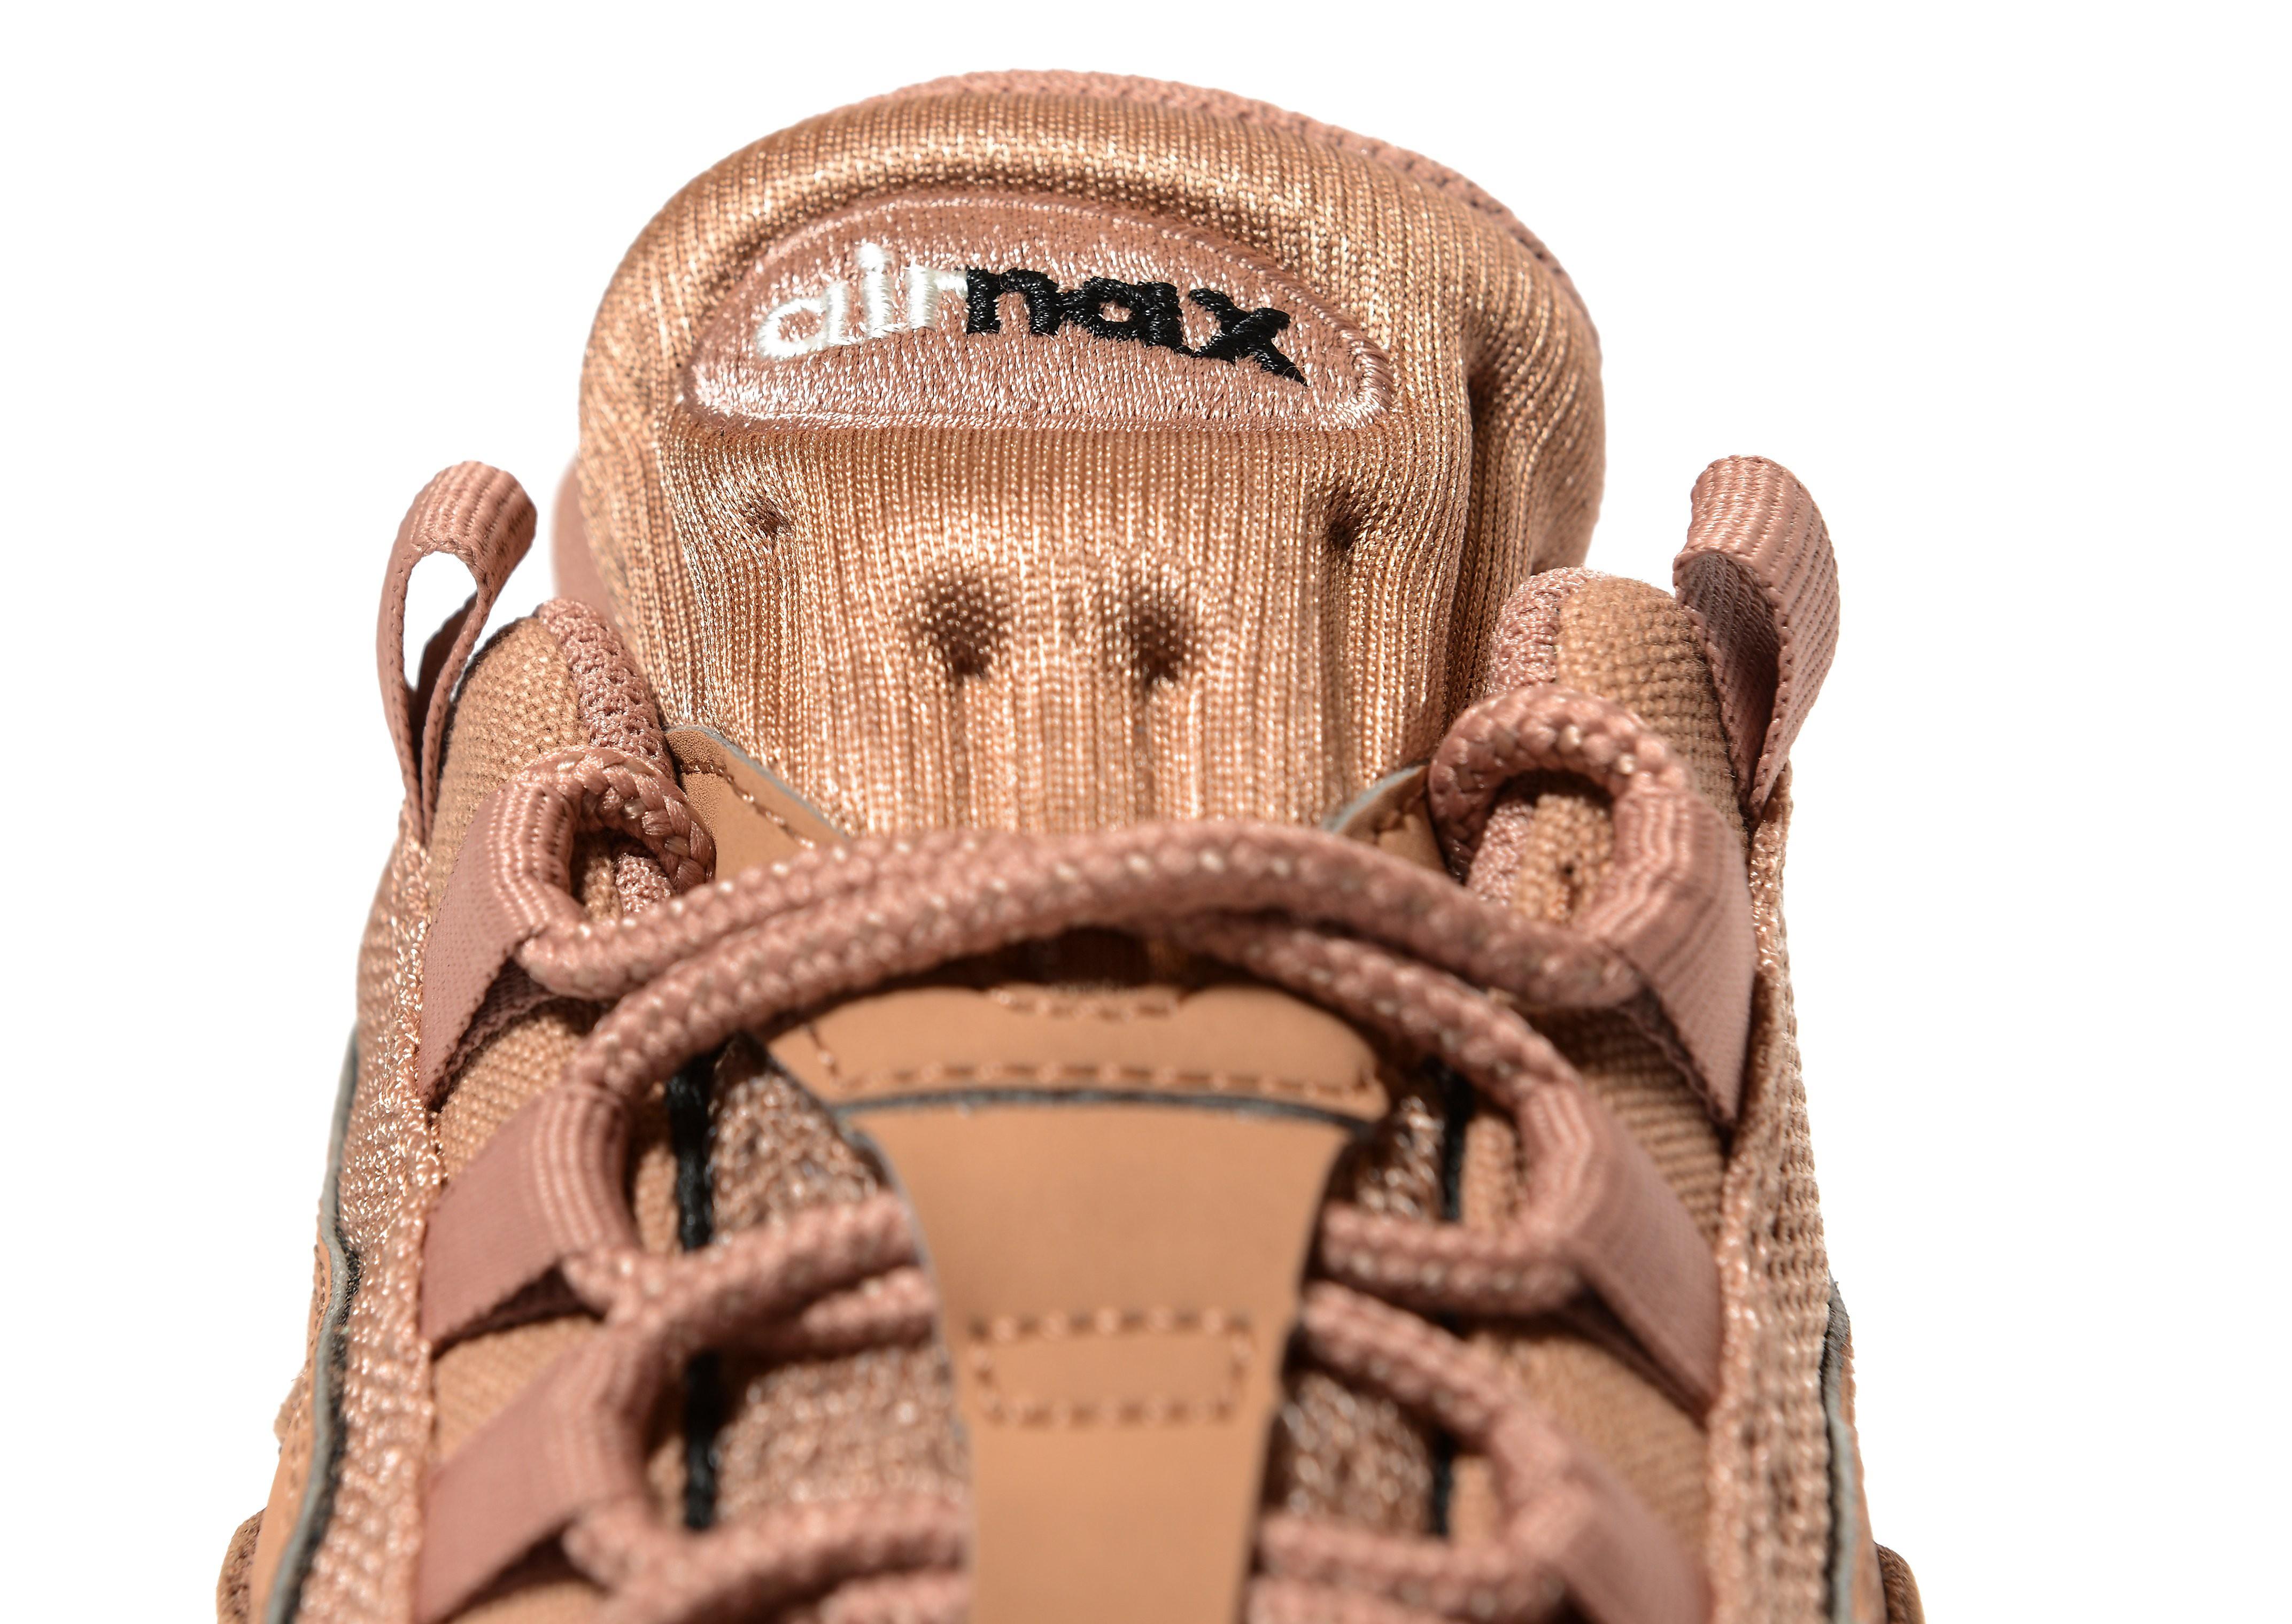 Nike Deportivas Air Max 95 originales para mujer